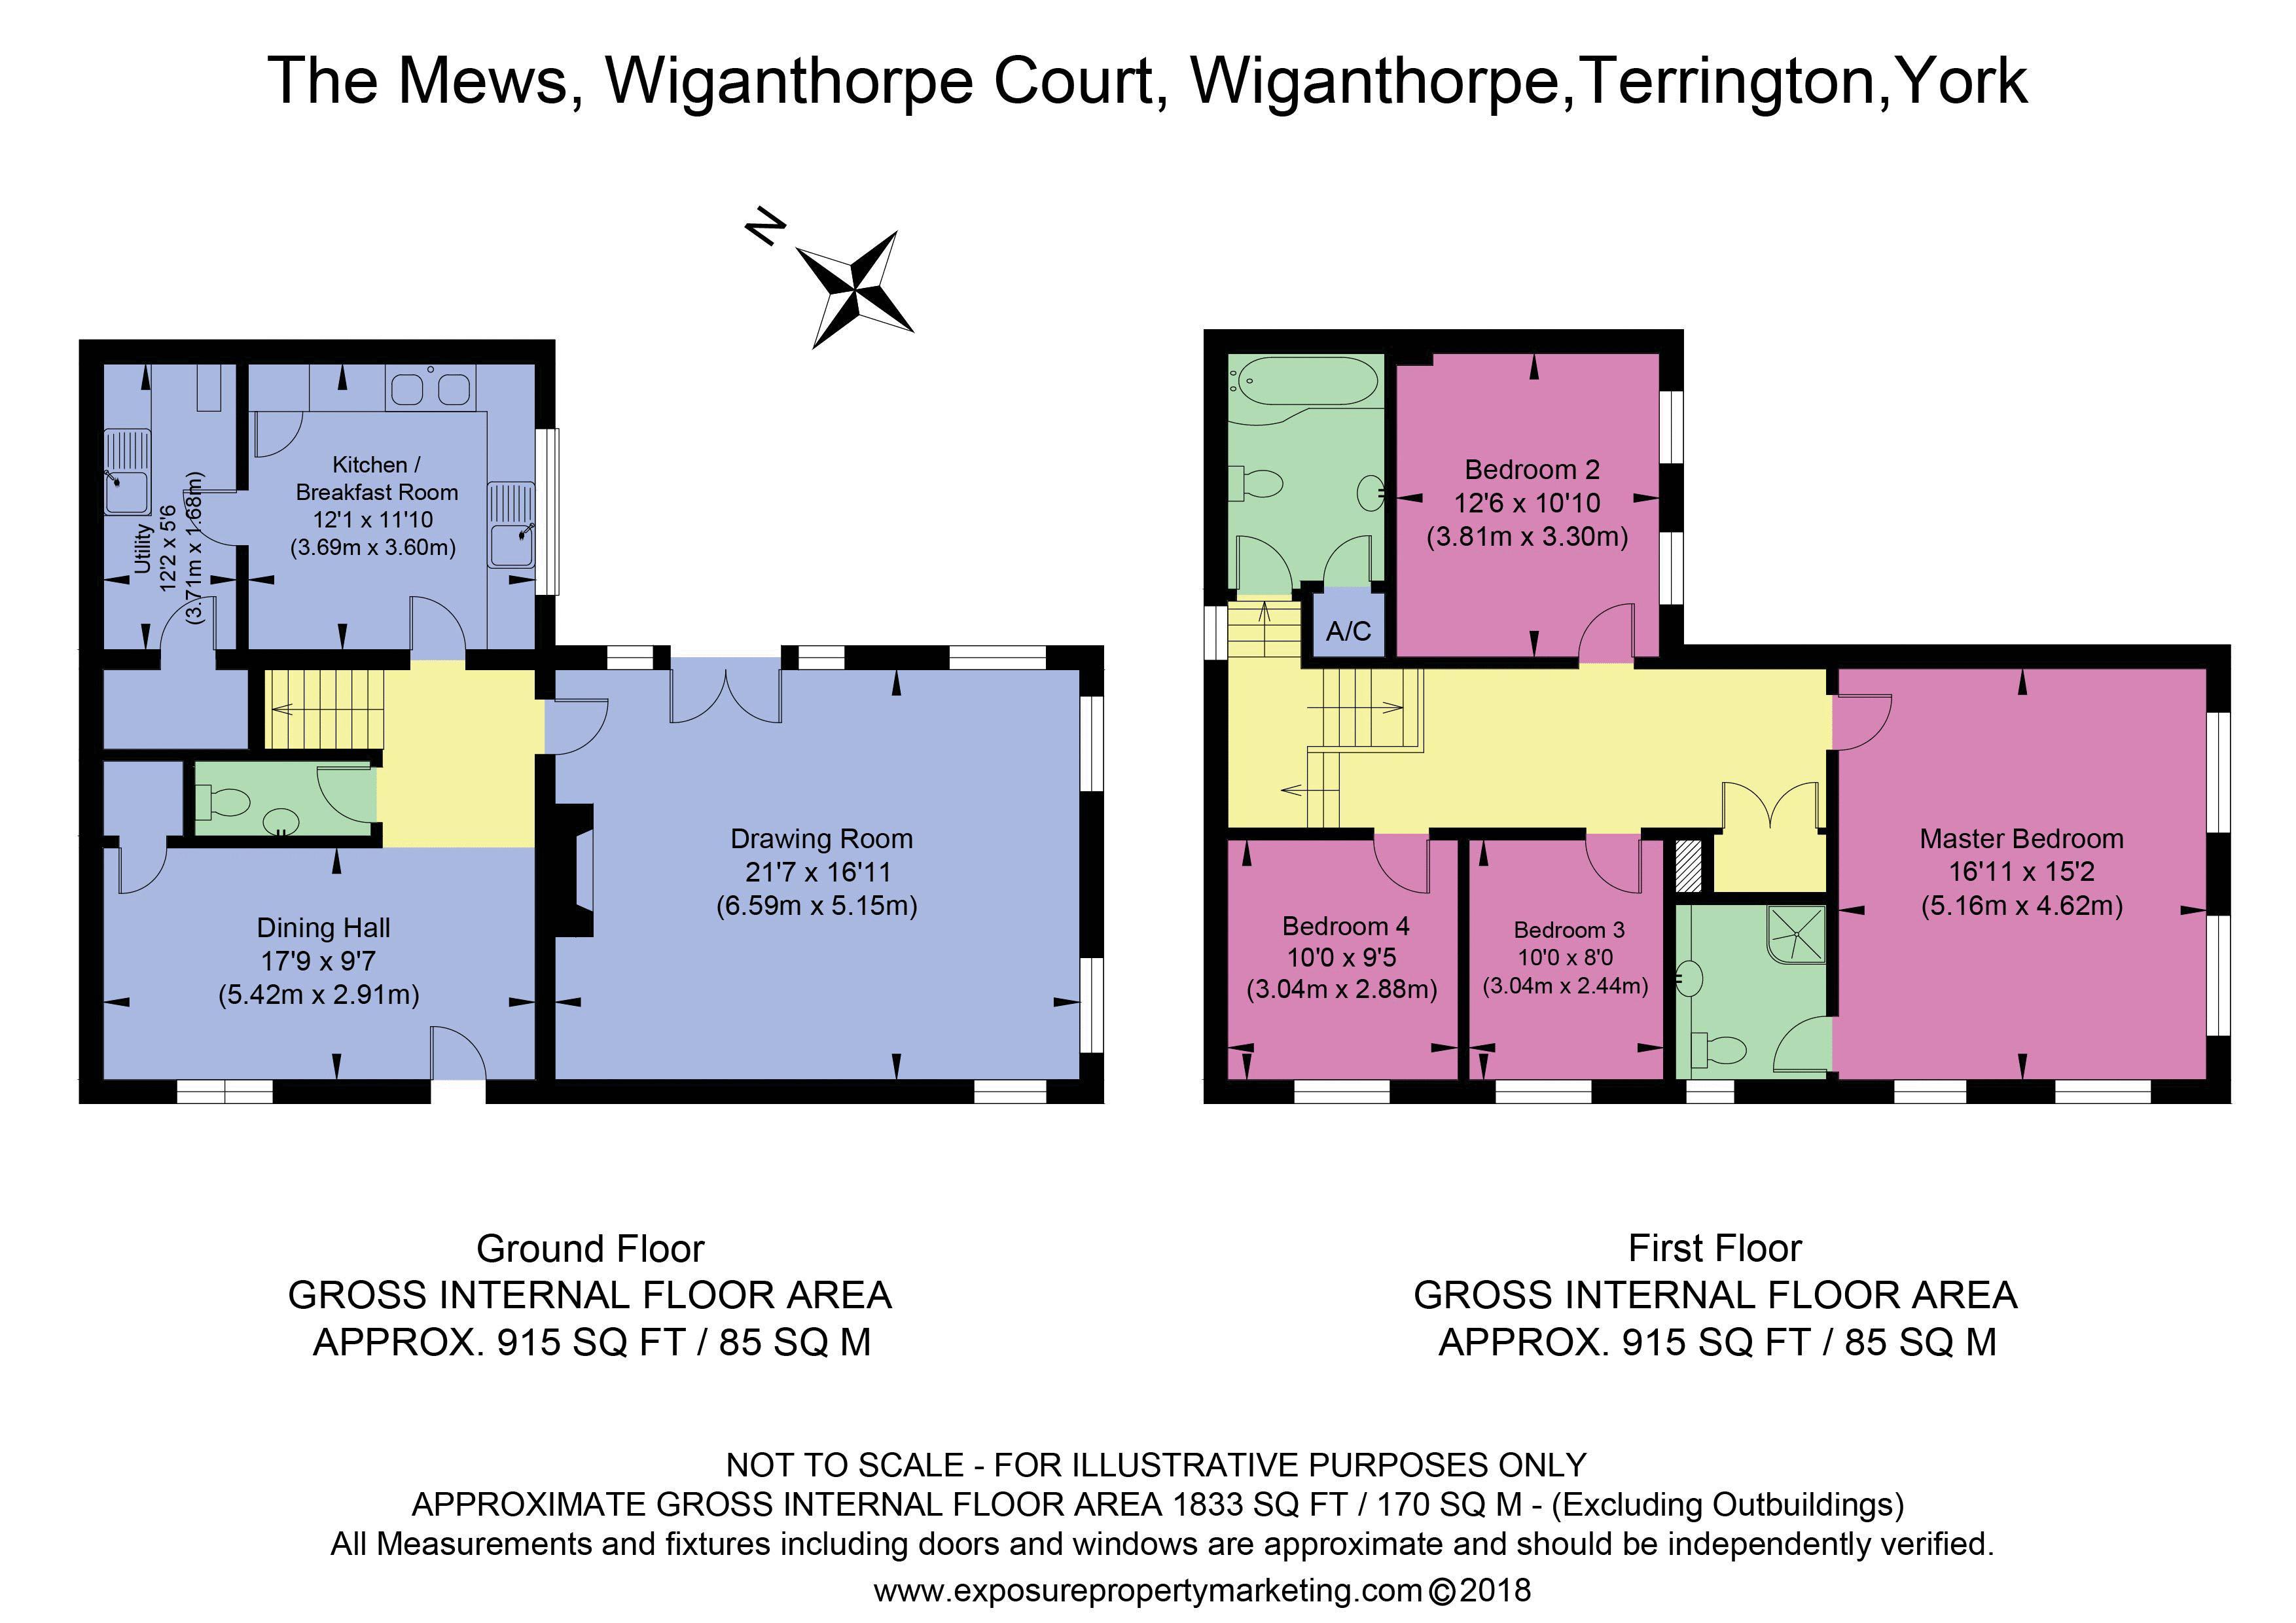 Wiganthorpe Terrington